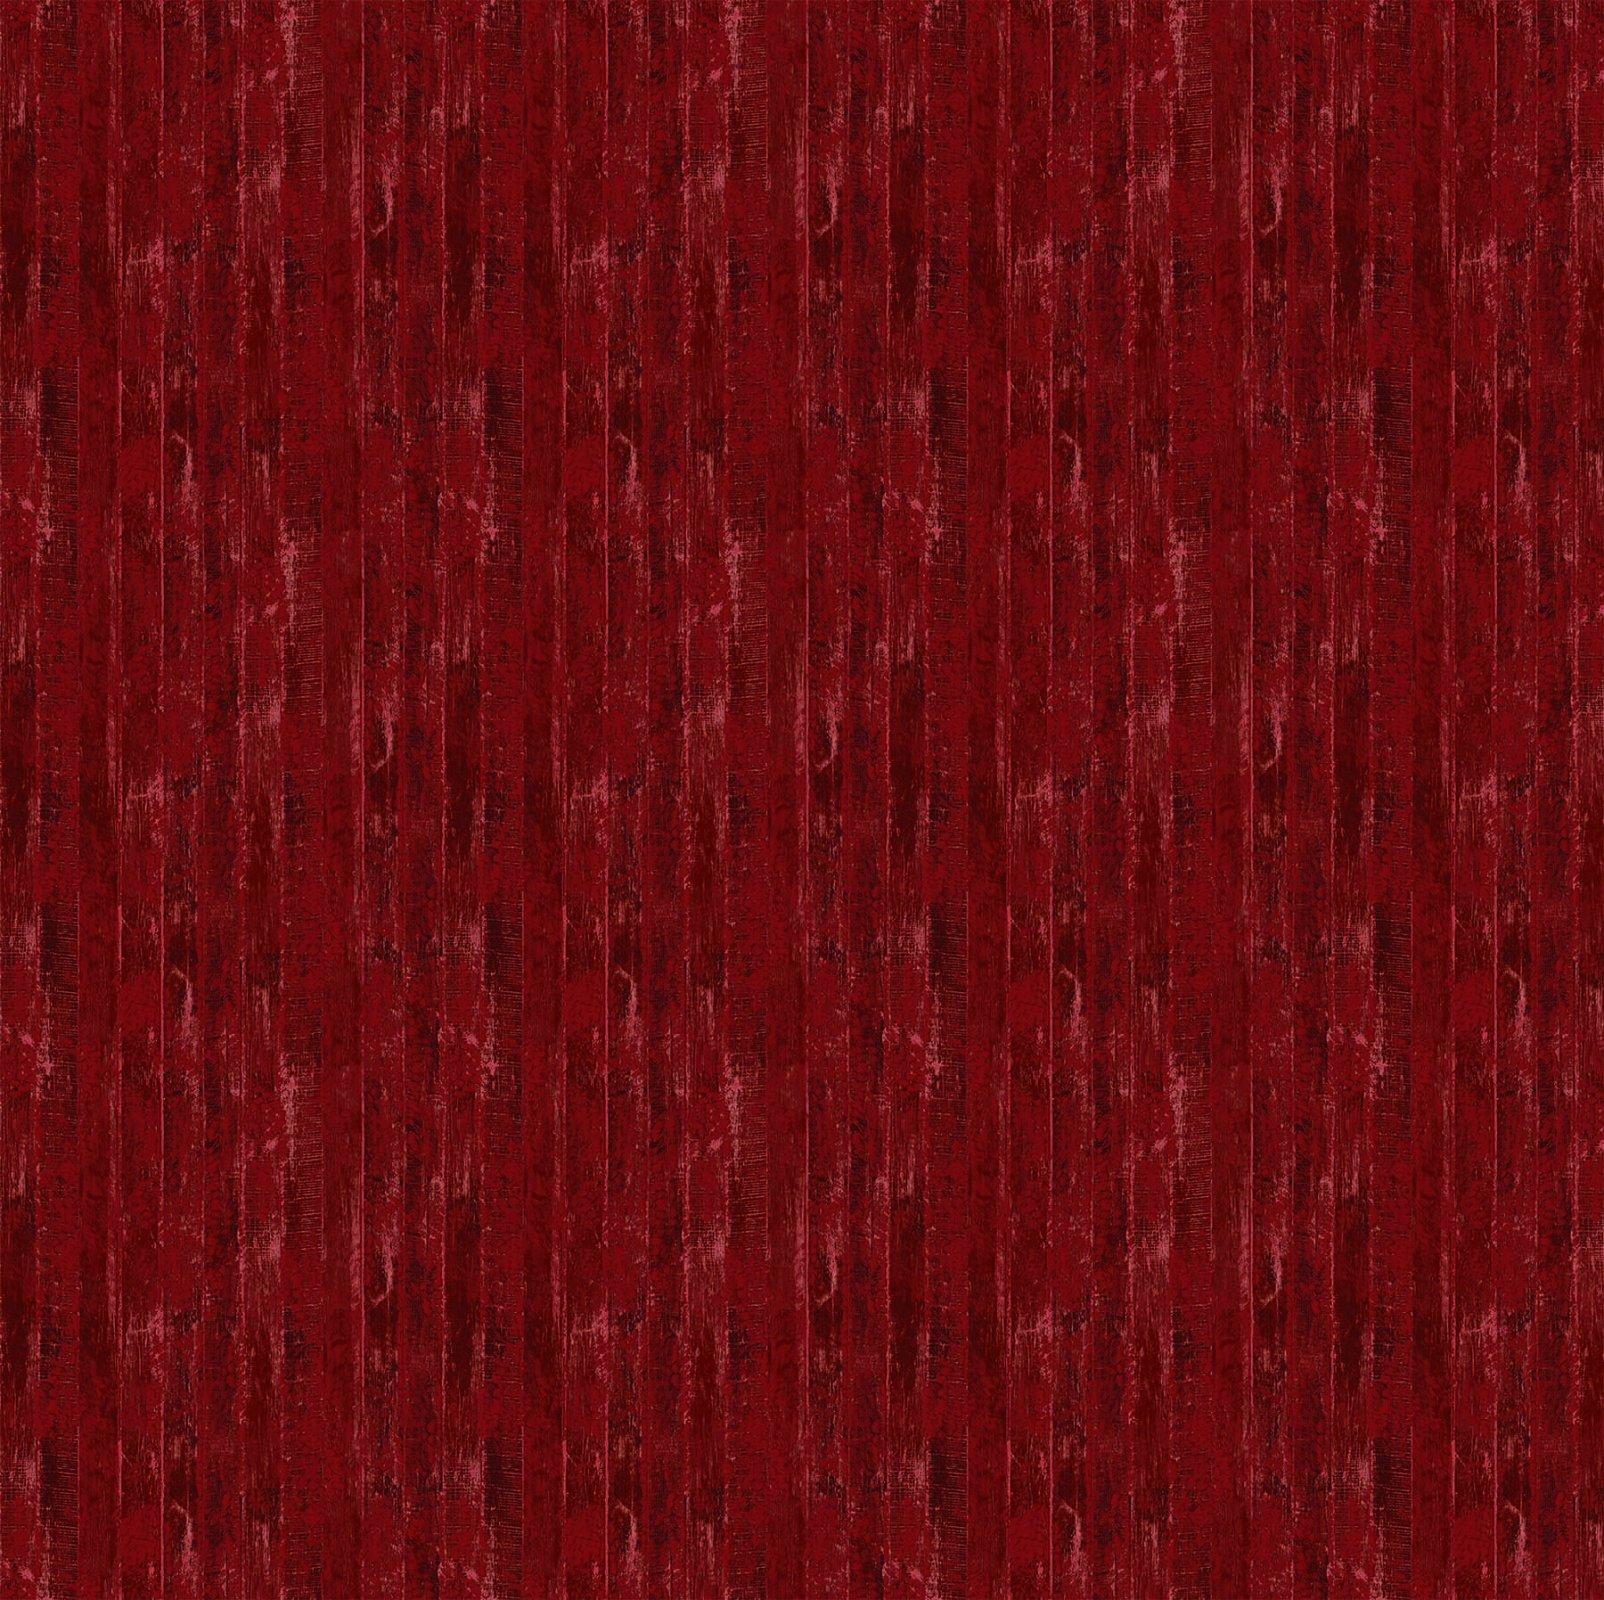 Northcott Christmas Wish 43469-24 Red Barn Wood